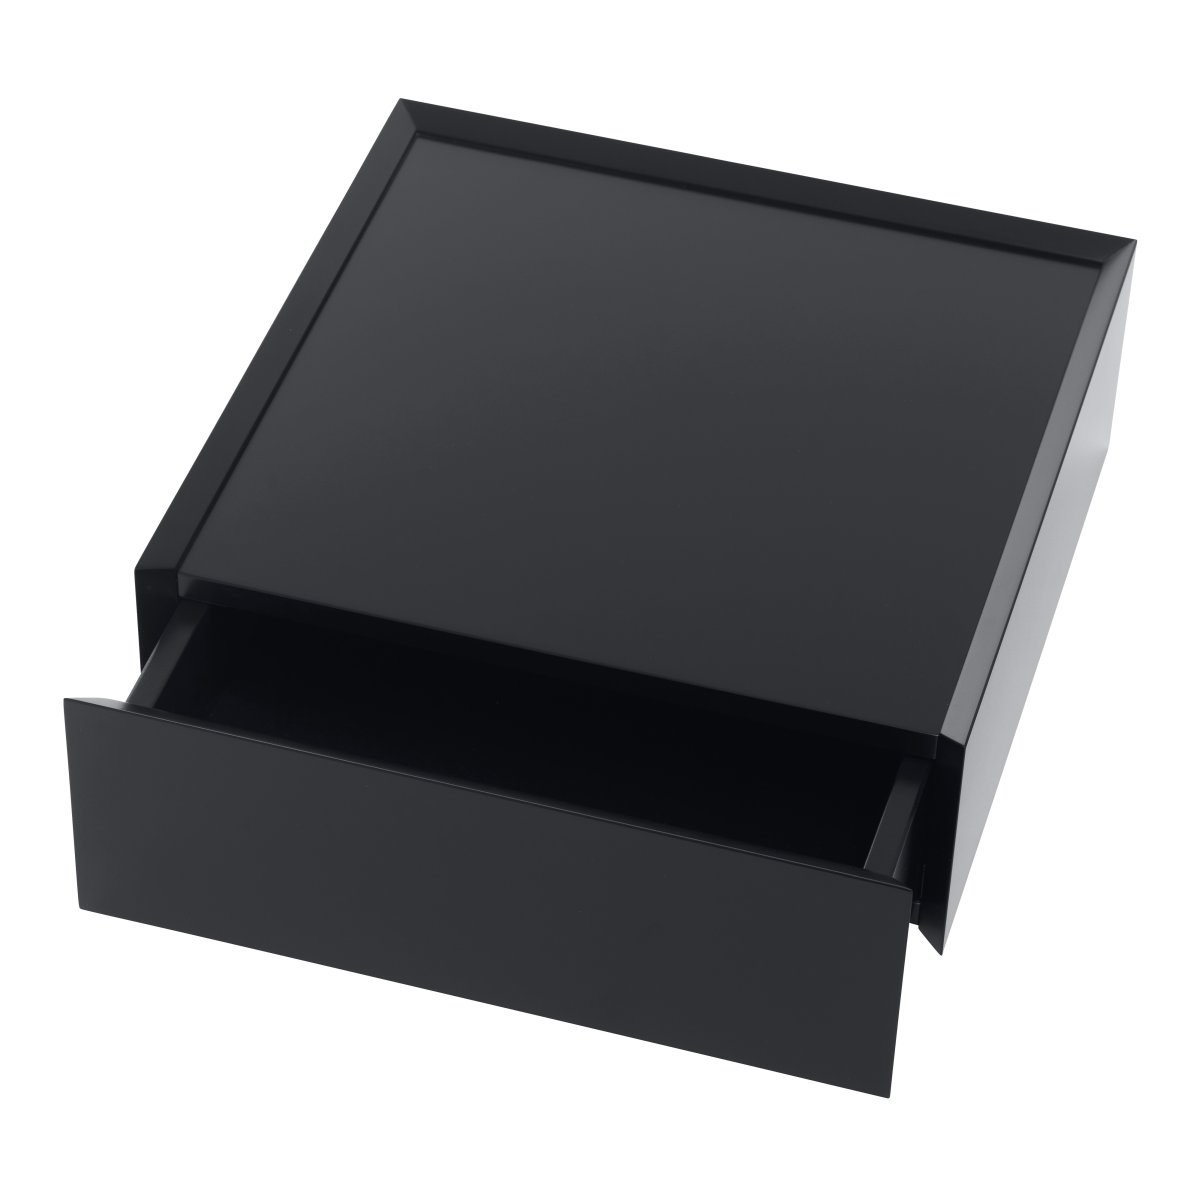 SOUVENIR Schubkastenbox 35 cm schwarz (46)